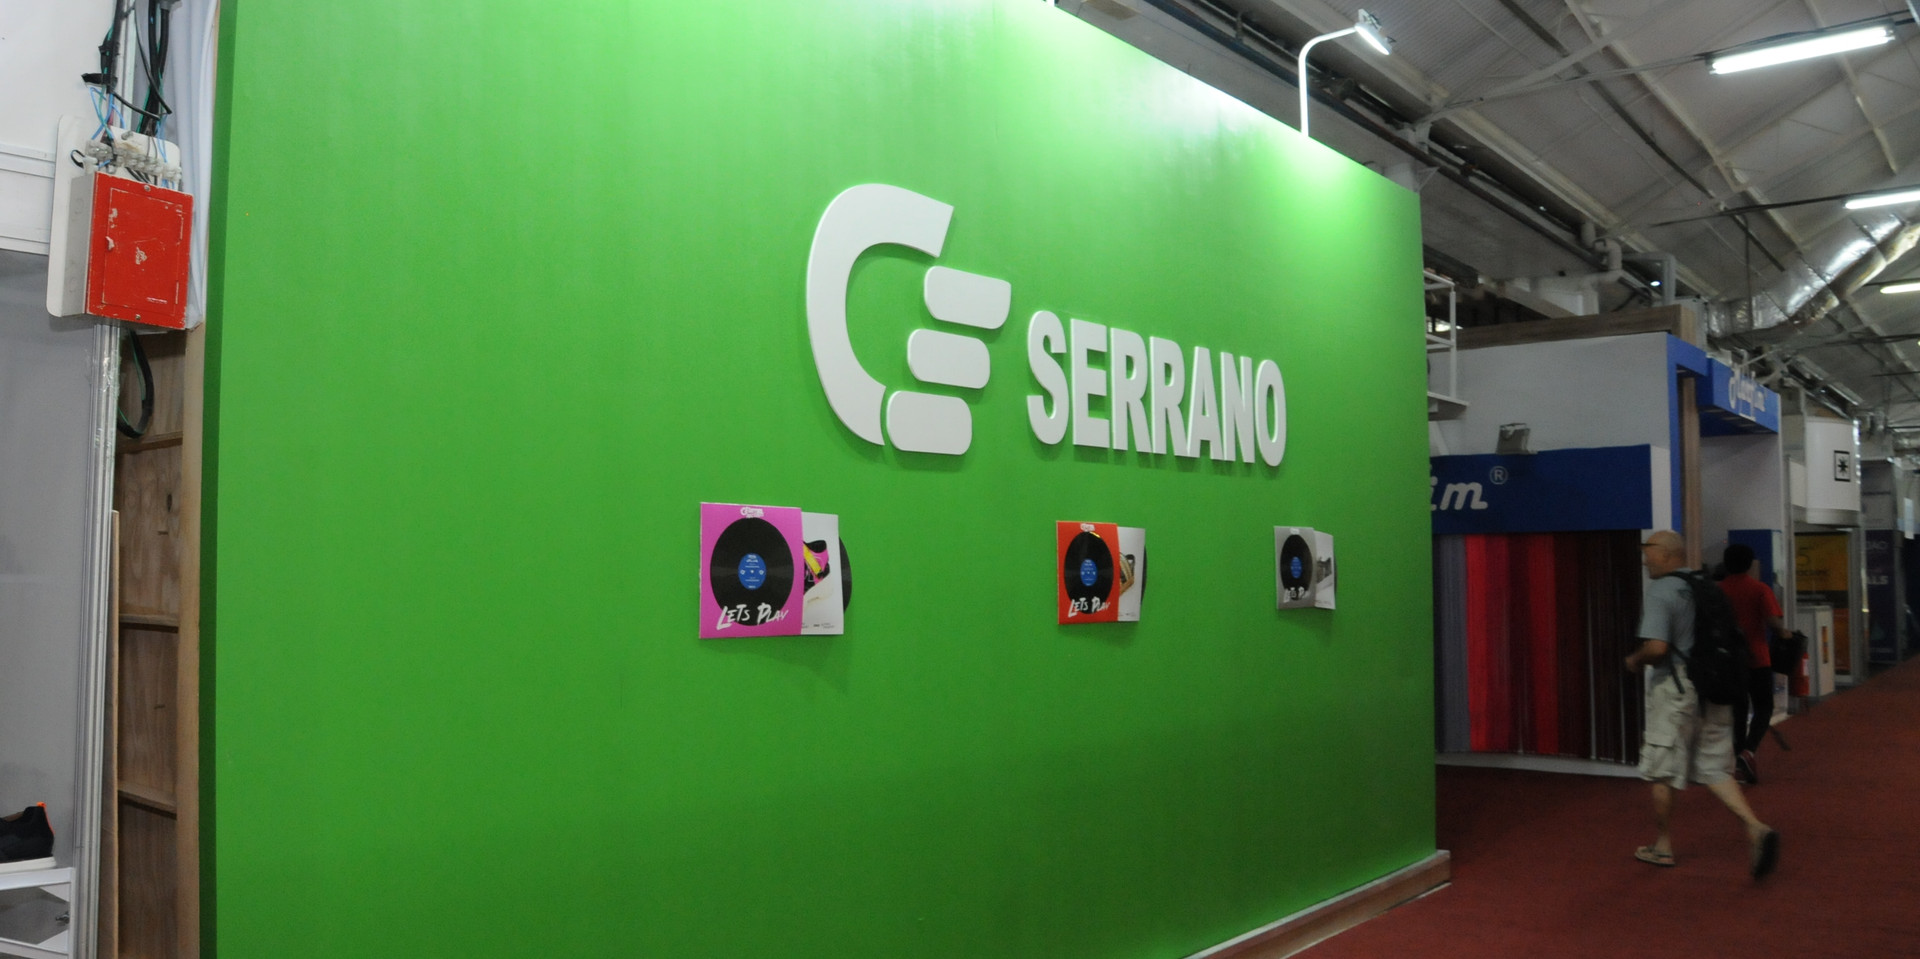 Serrano_(1)[1].JPG